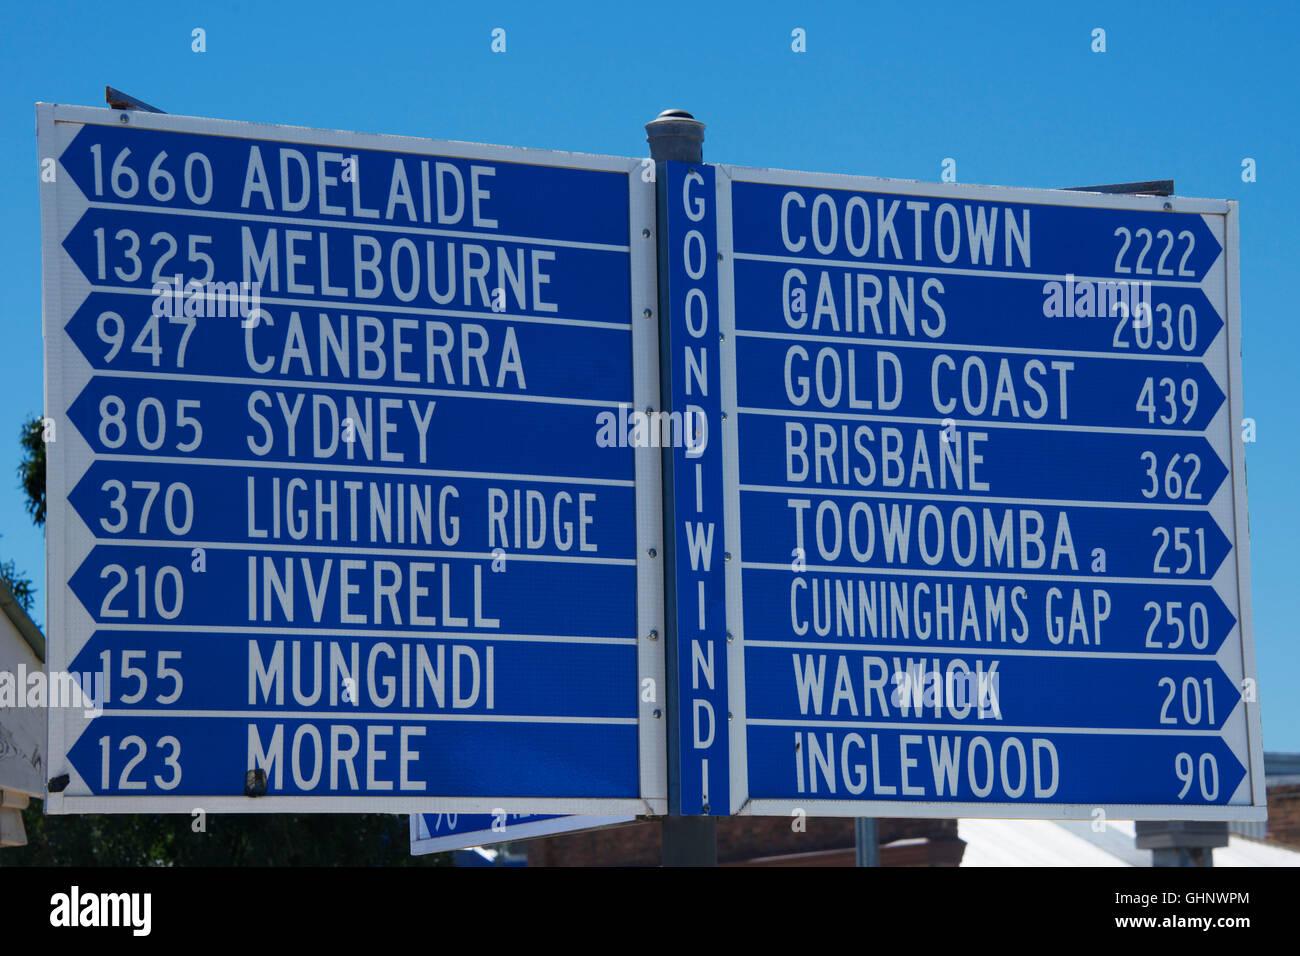 Signpost with road distances Goondiwindi Queensland Australia - Stock Image